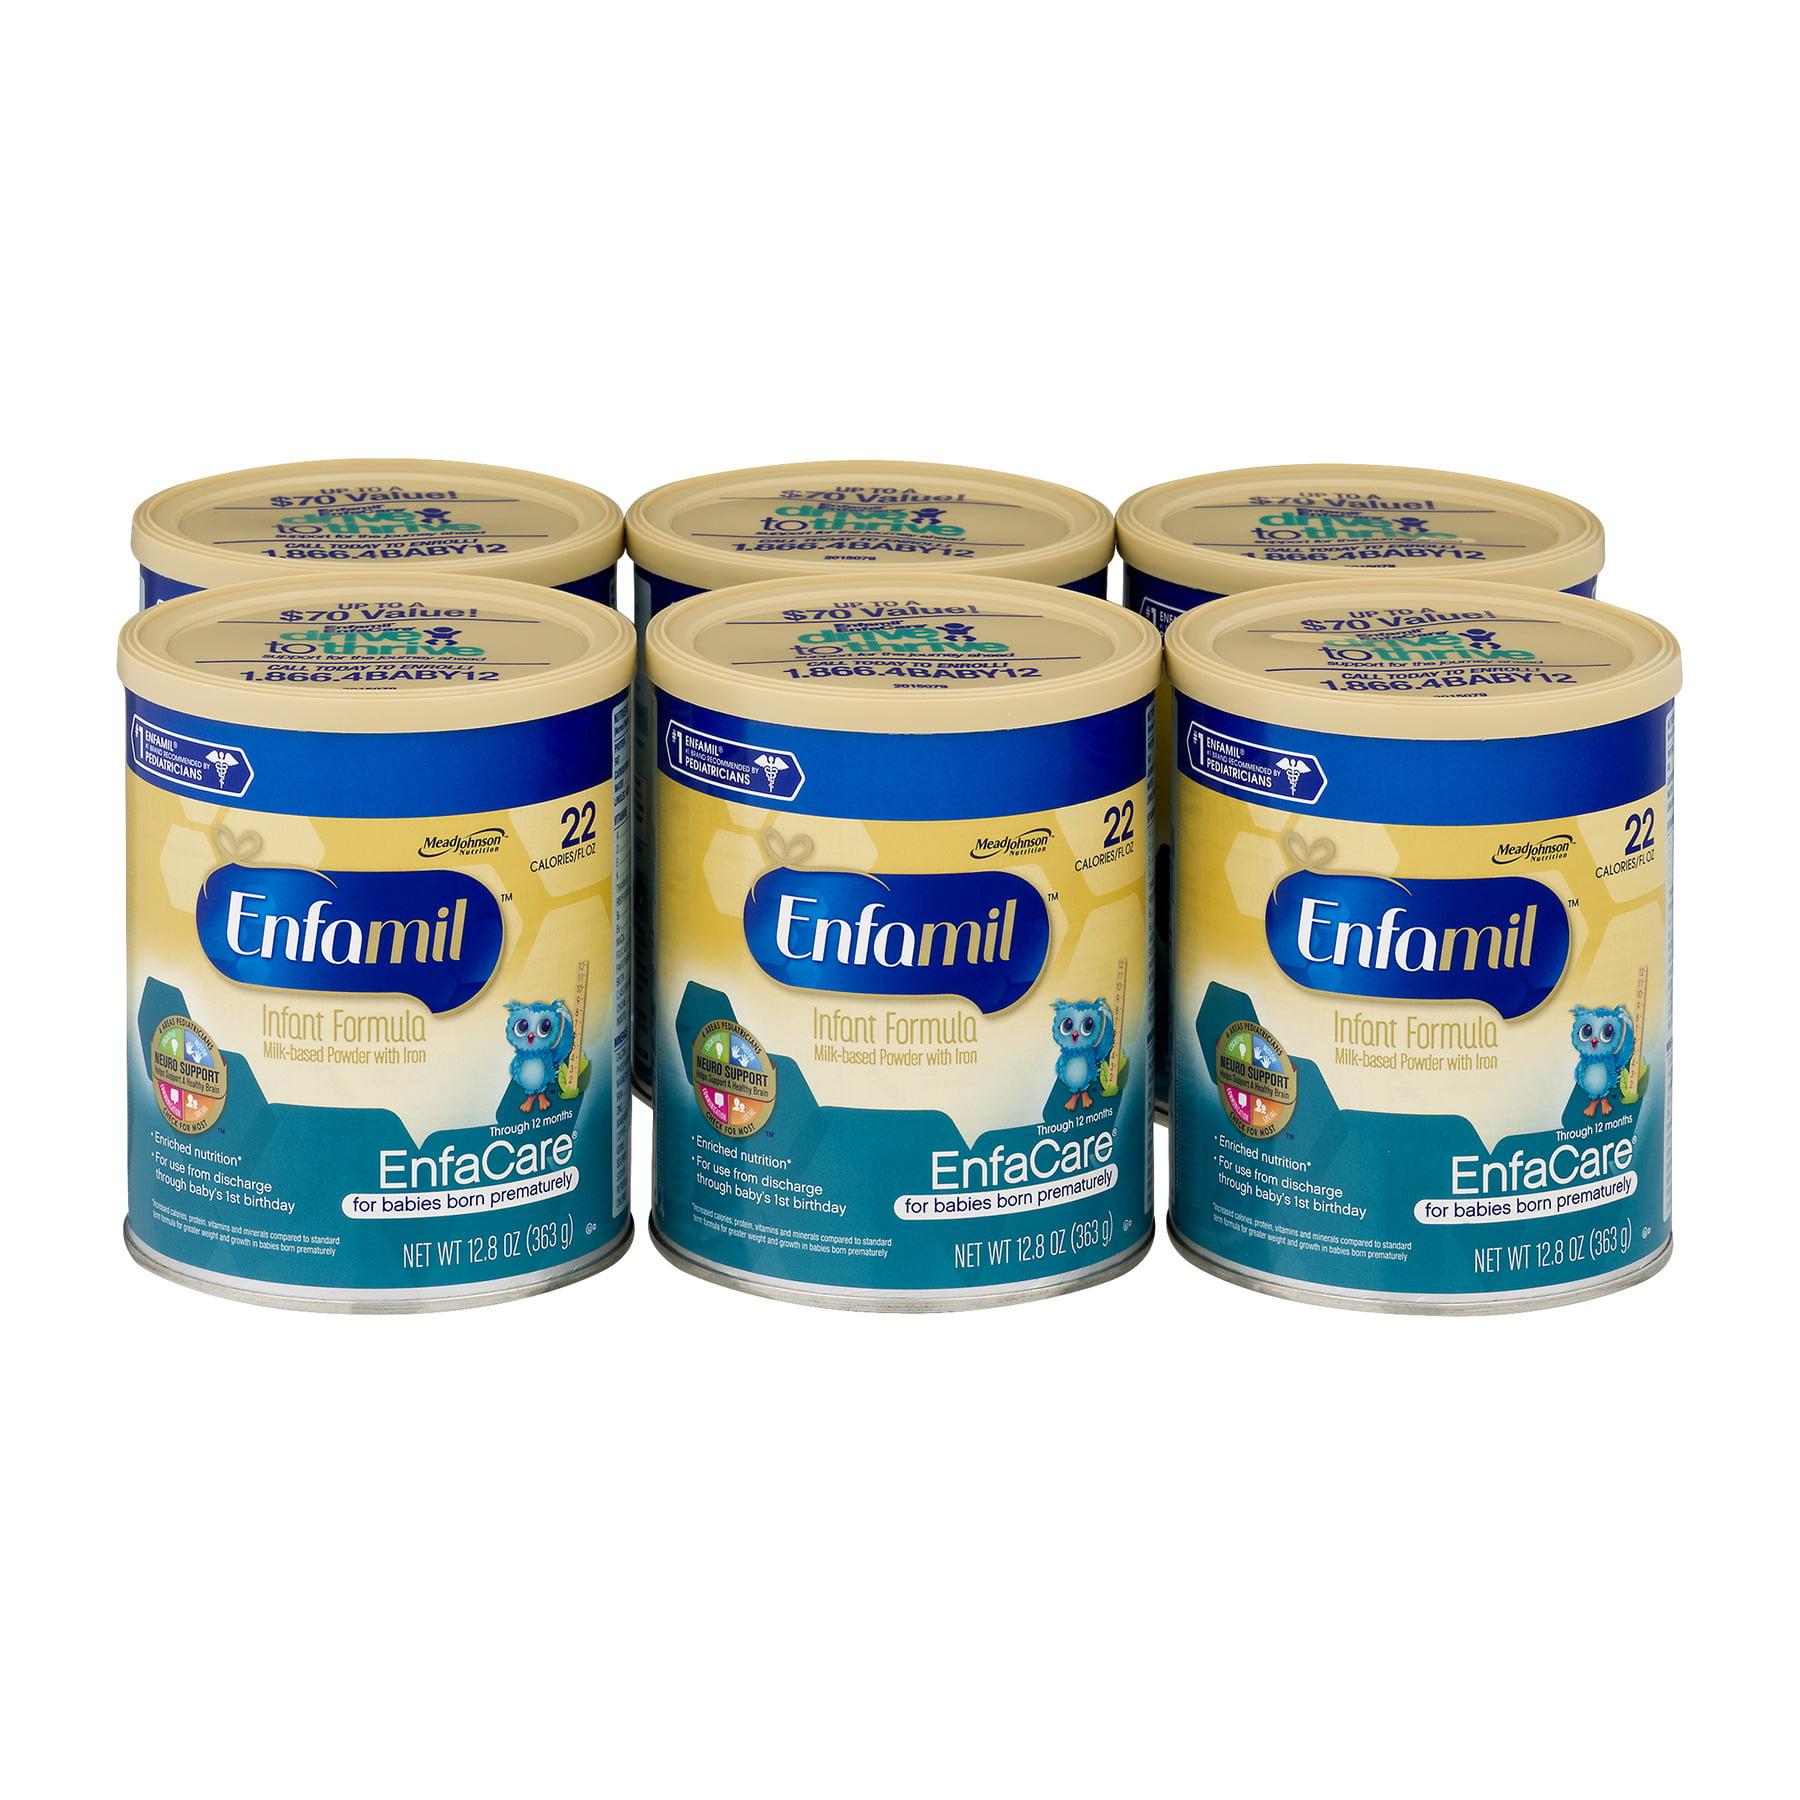 Enfamil EnfaCare Baby Bormula-12.8 oz Powder Can (Pack of 6)